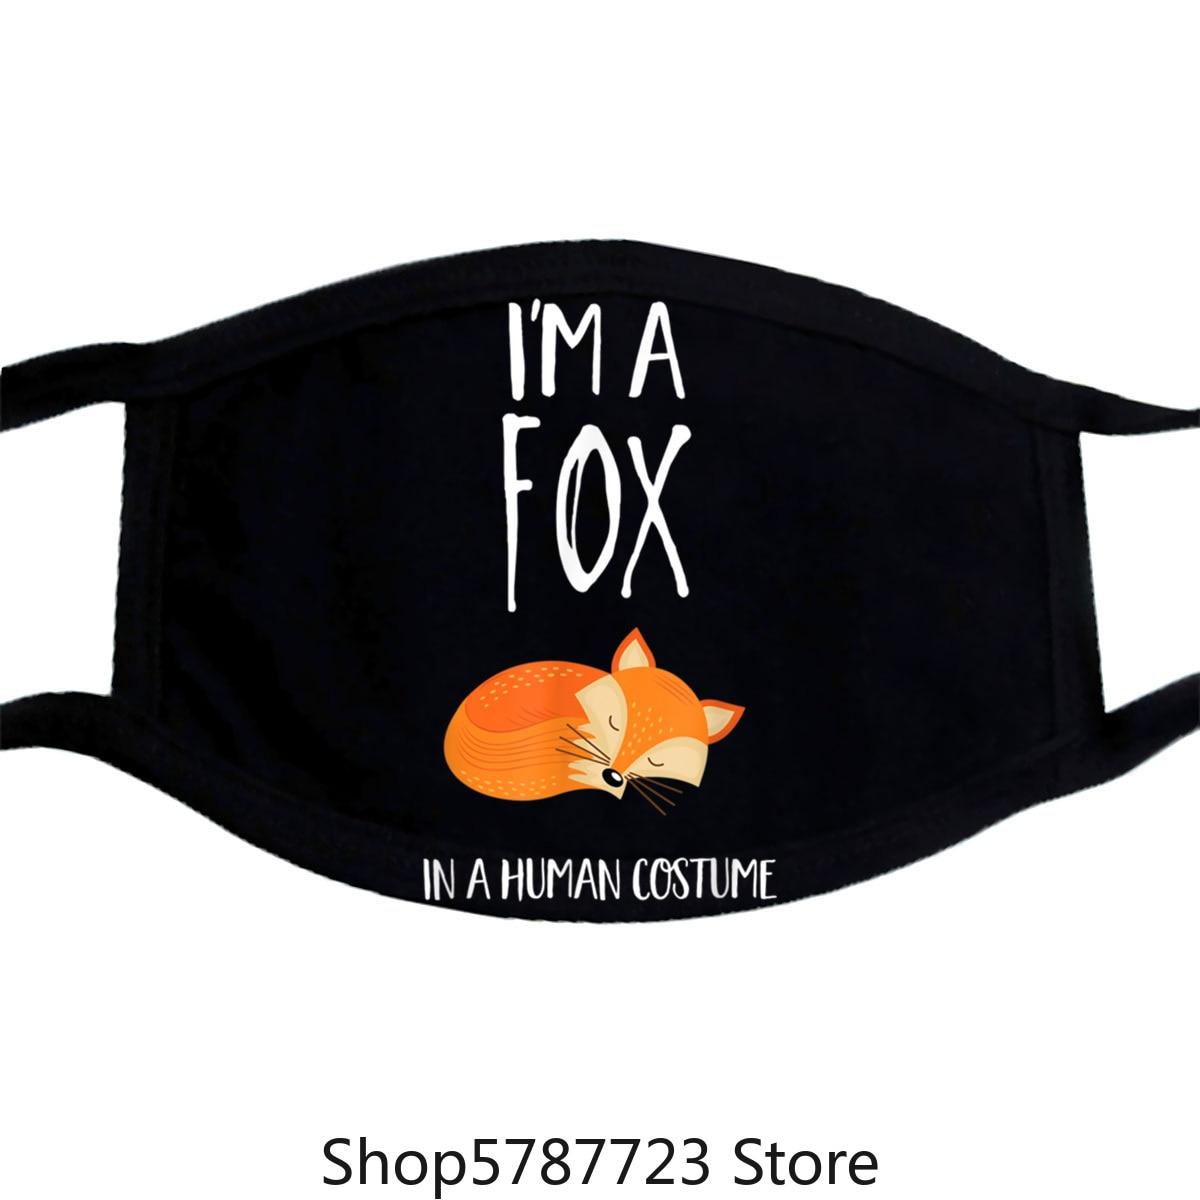 Im A Fox In A Human Costume Mask